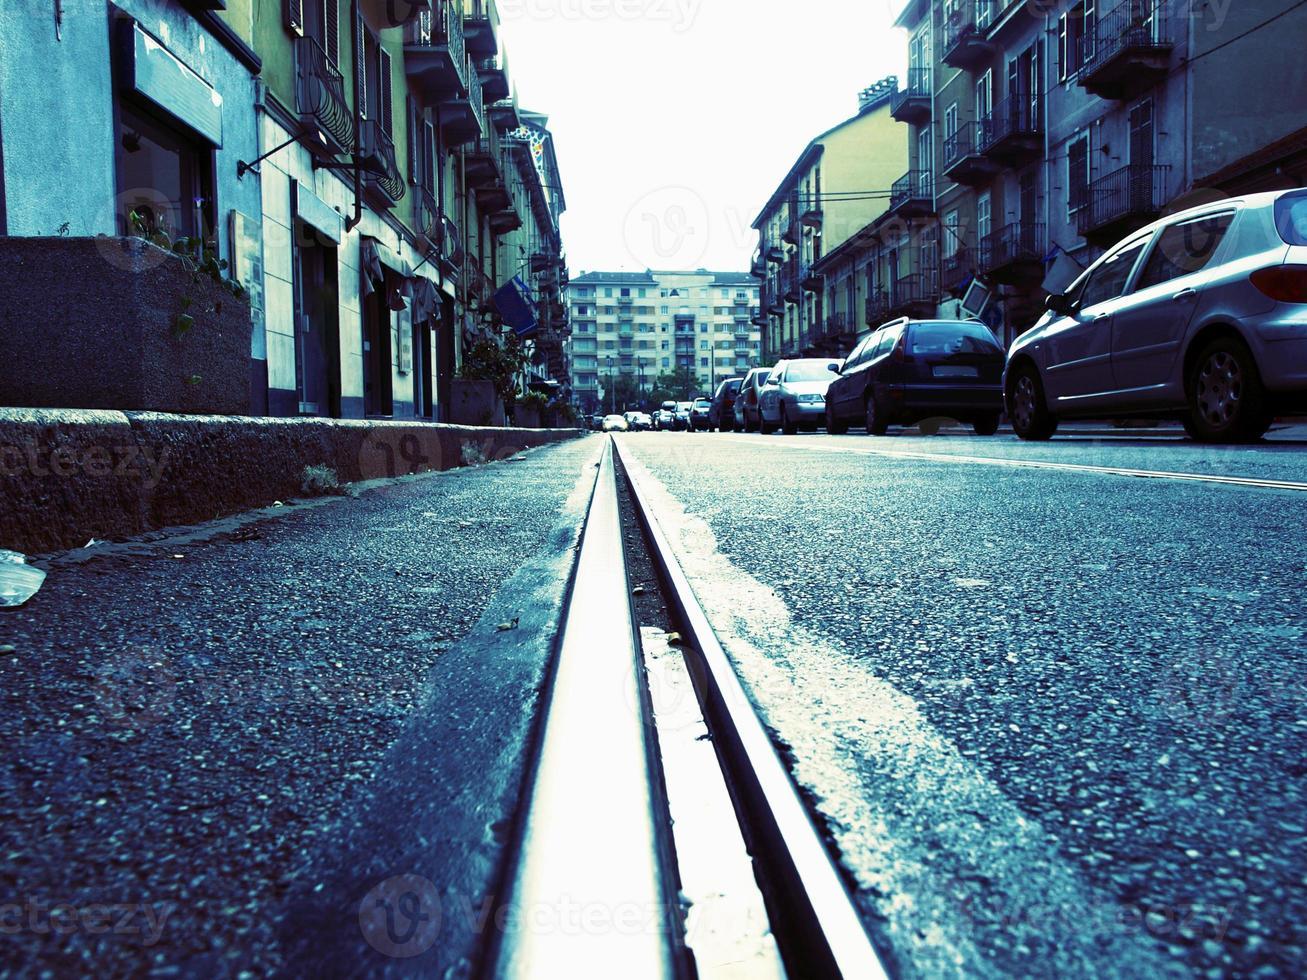 calle vacía con vías de tranvía foto